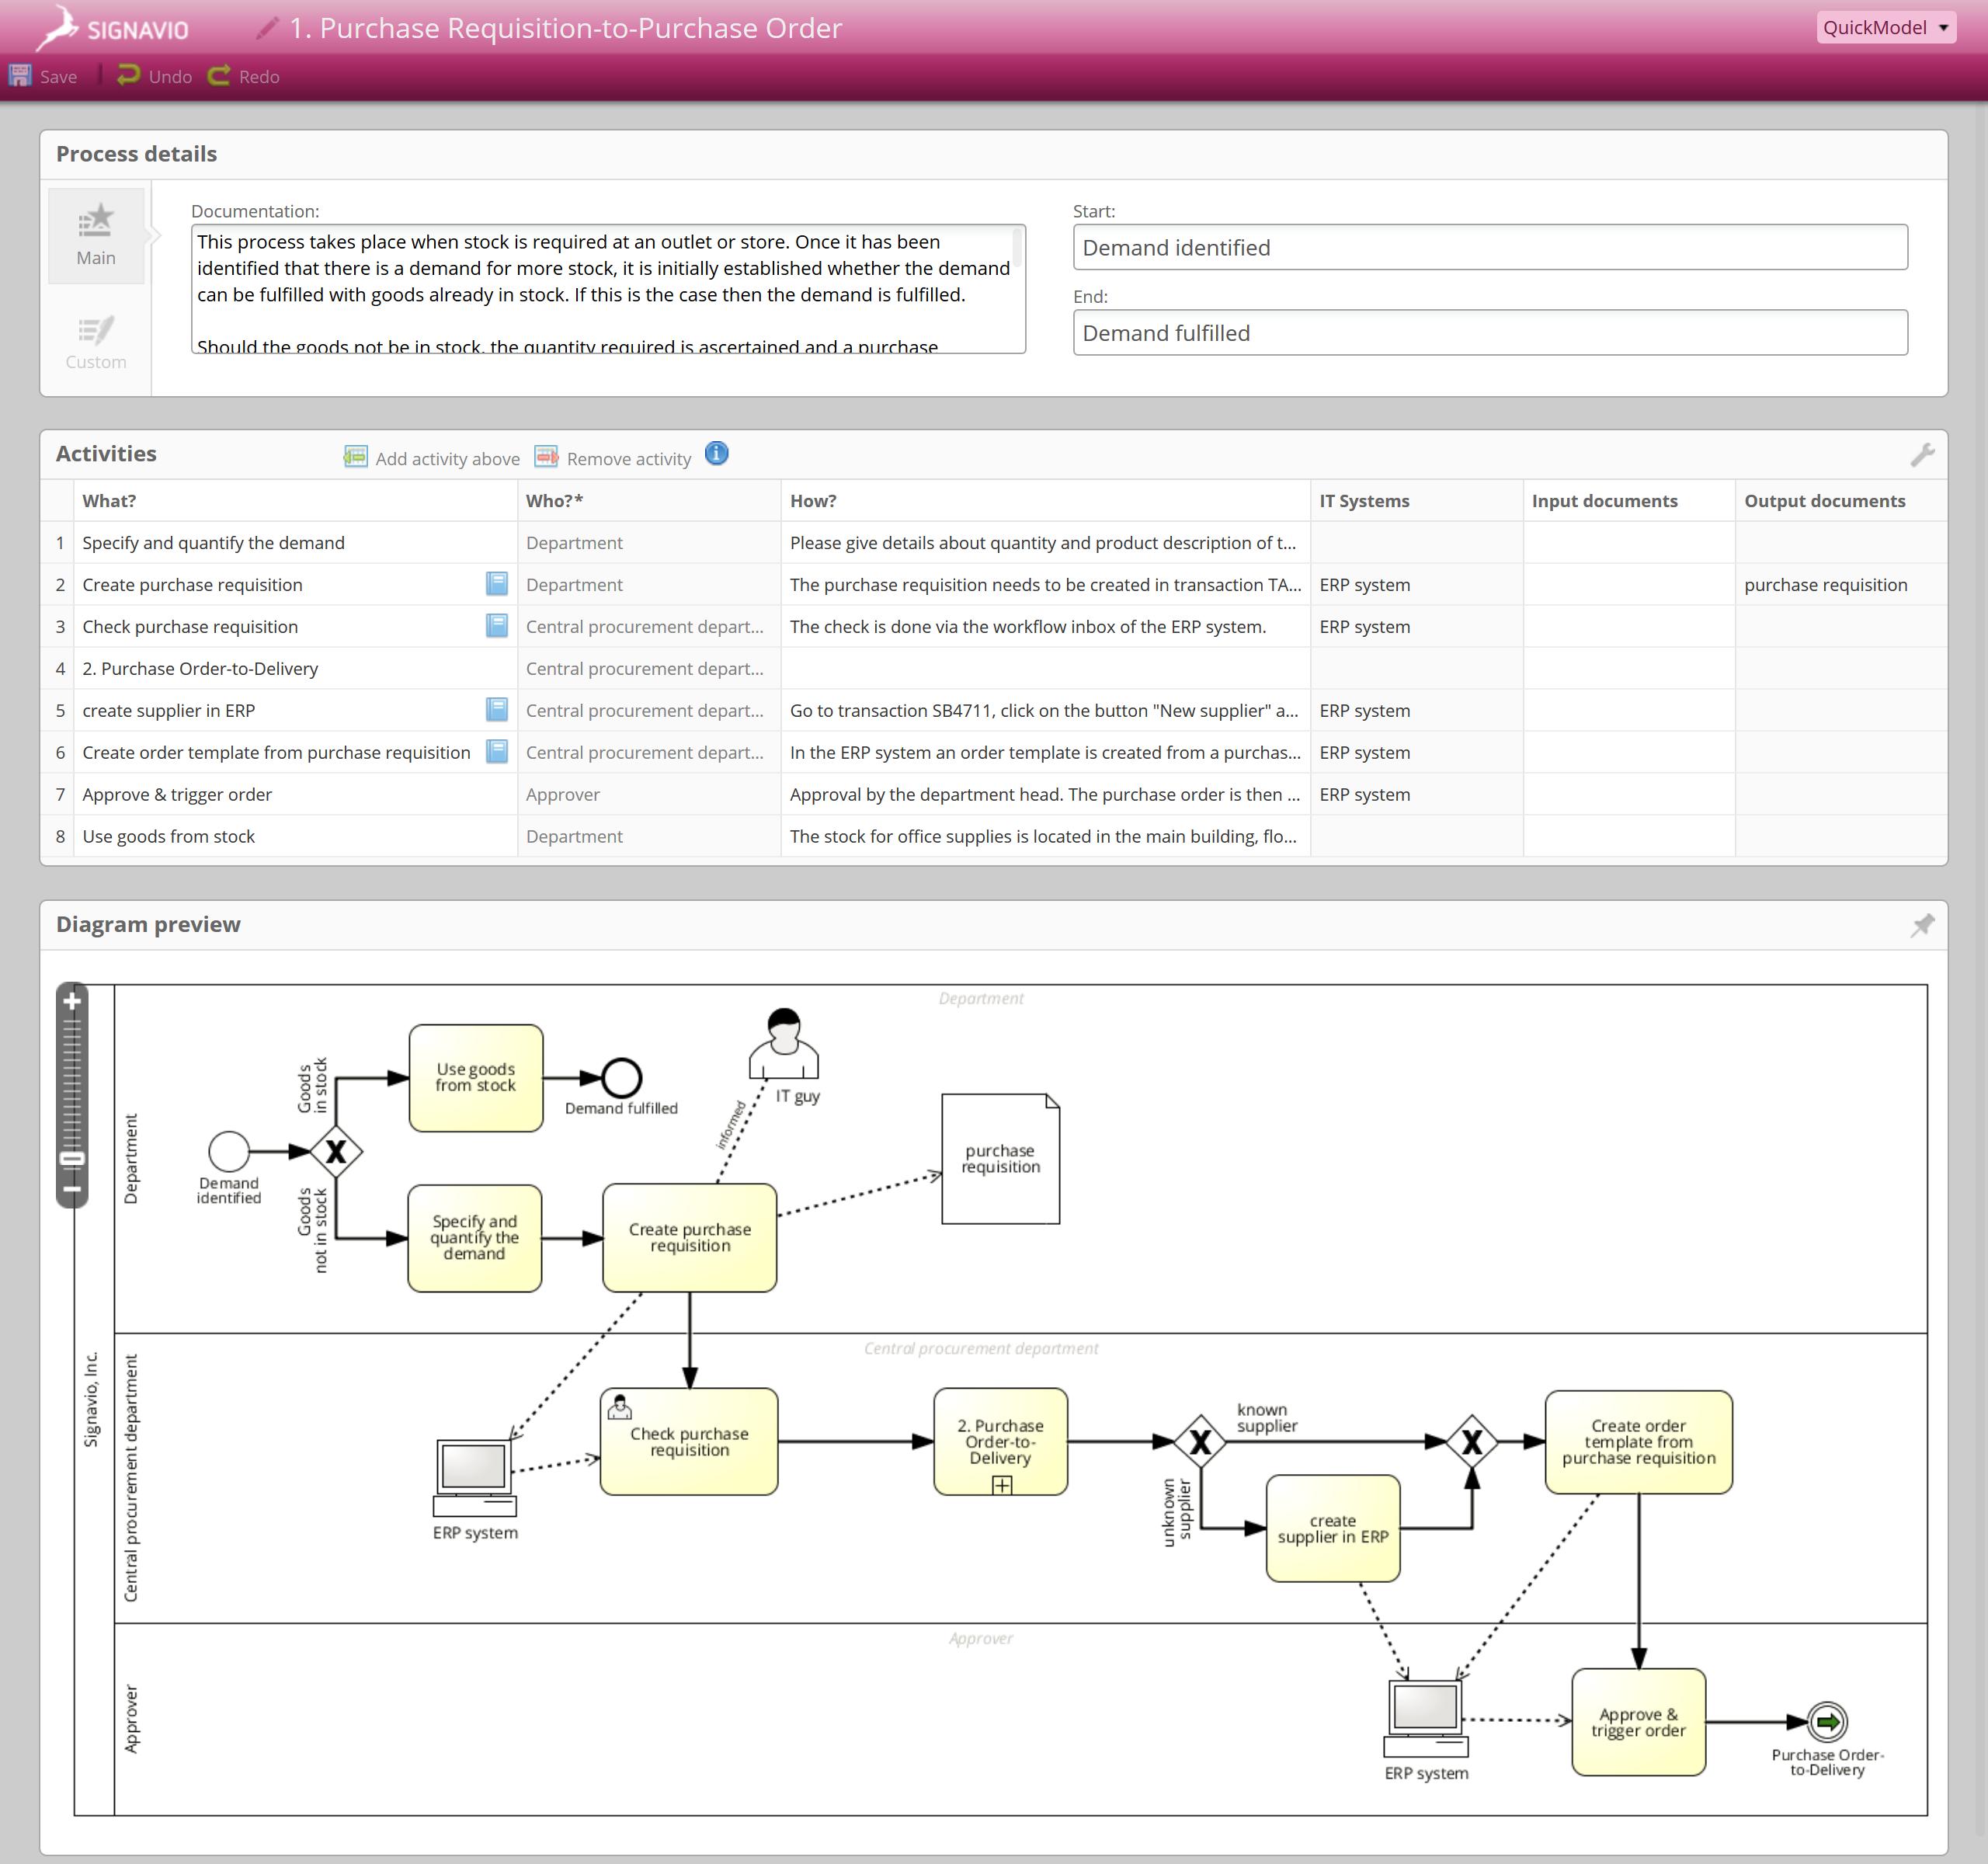 Process Manager Demo - Signavio Quickmodel